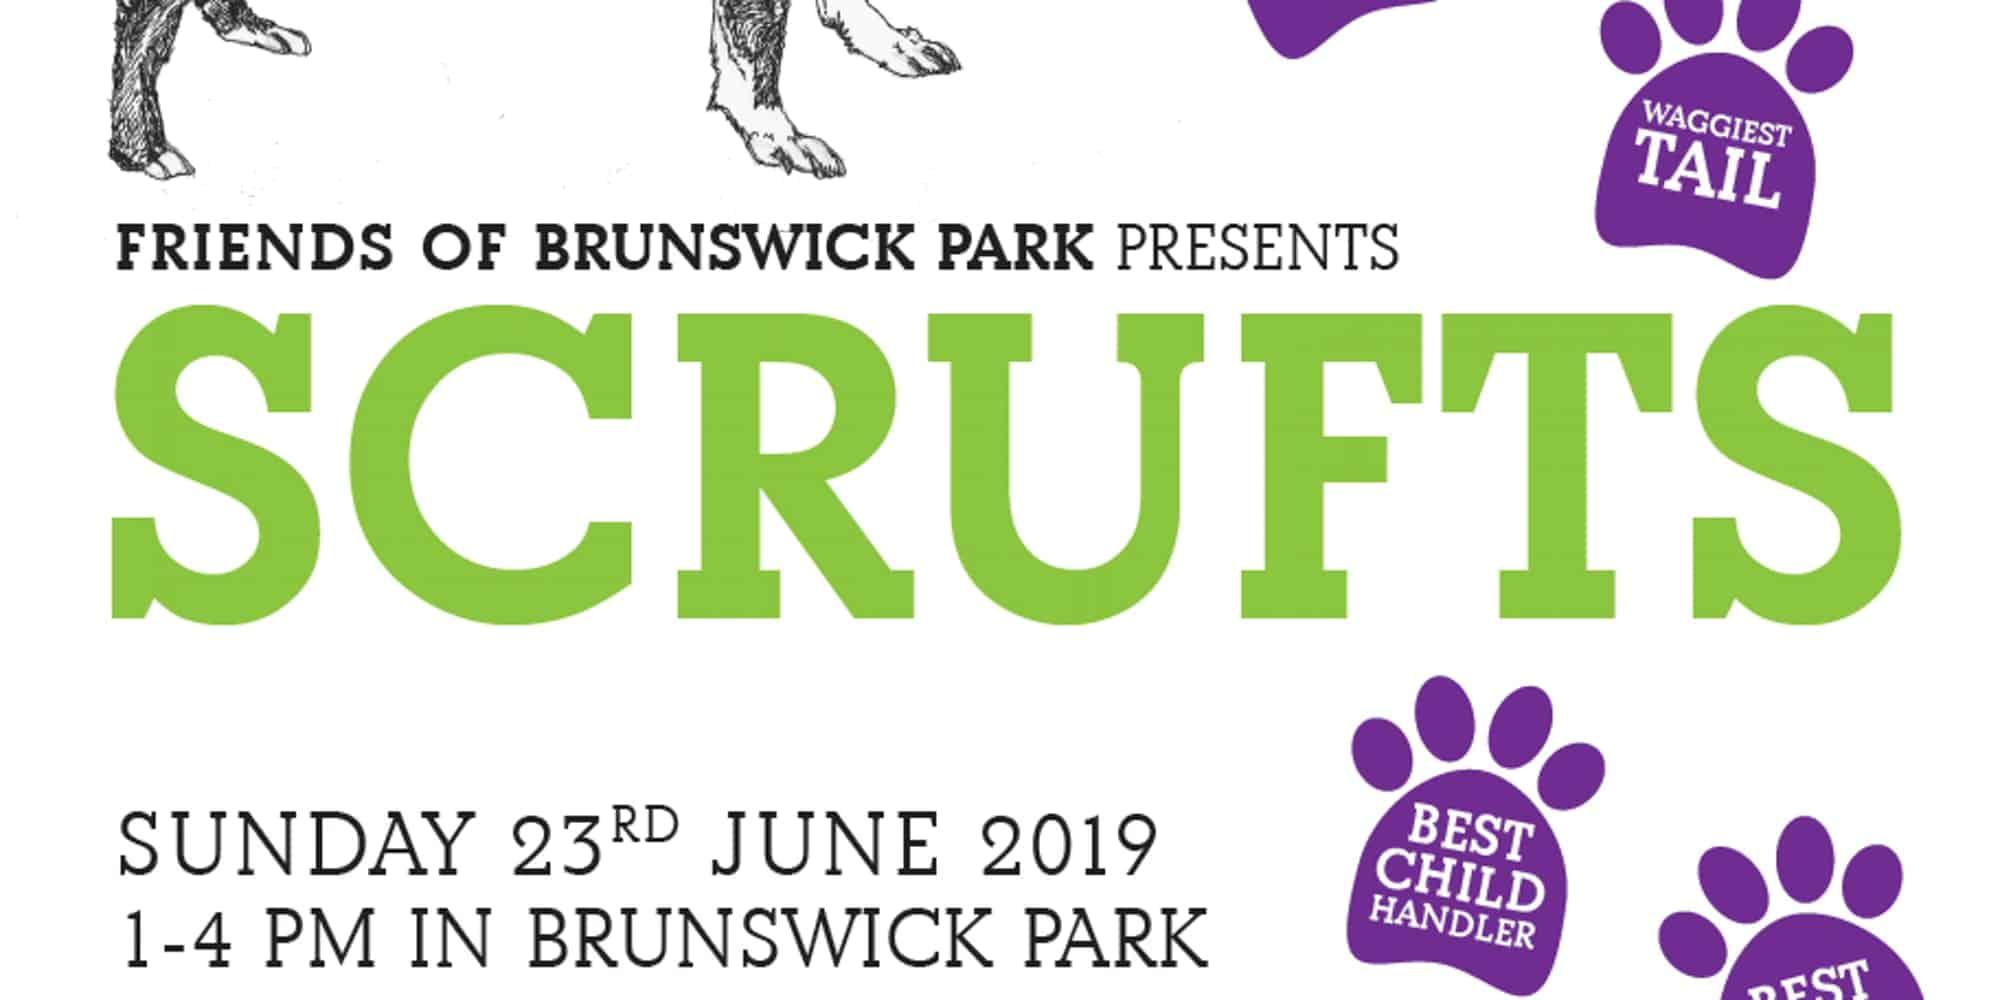 Scrufts Dog Show 2019 Brunswick Park